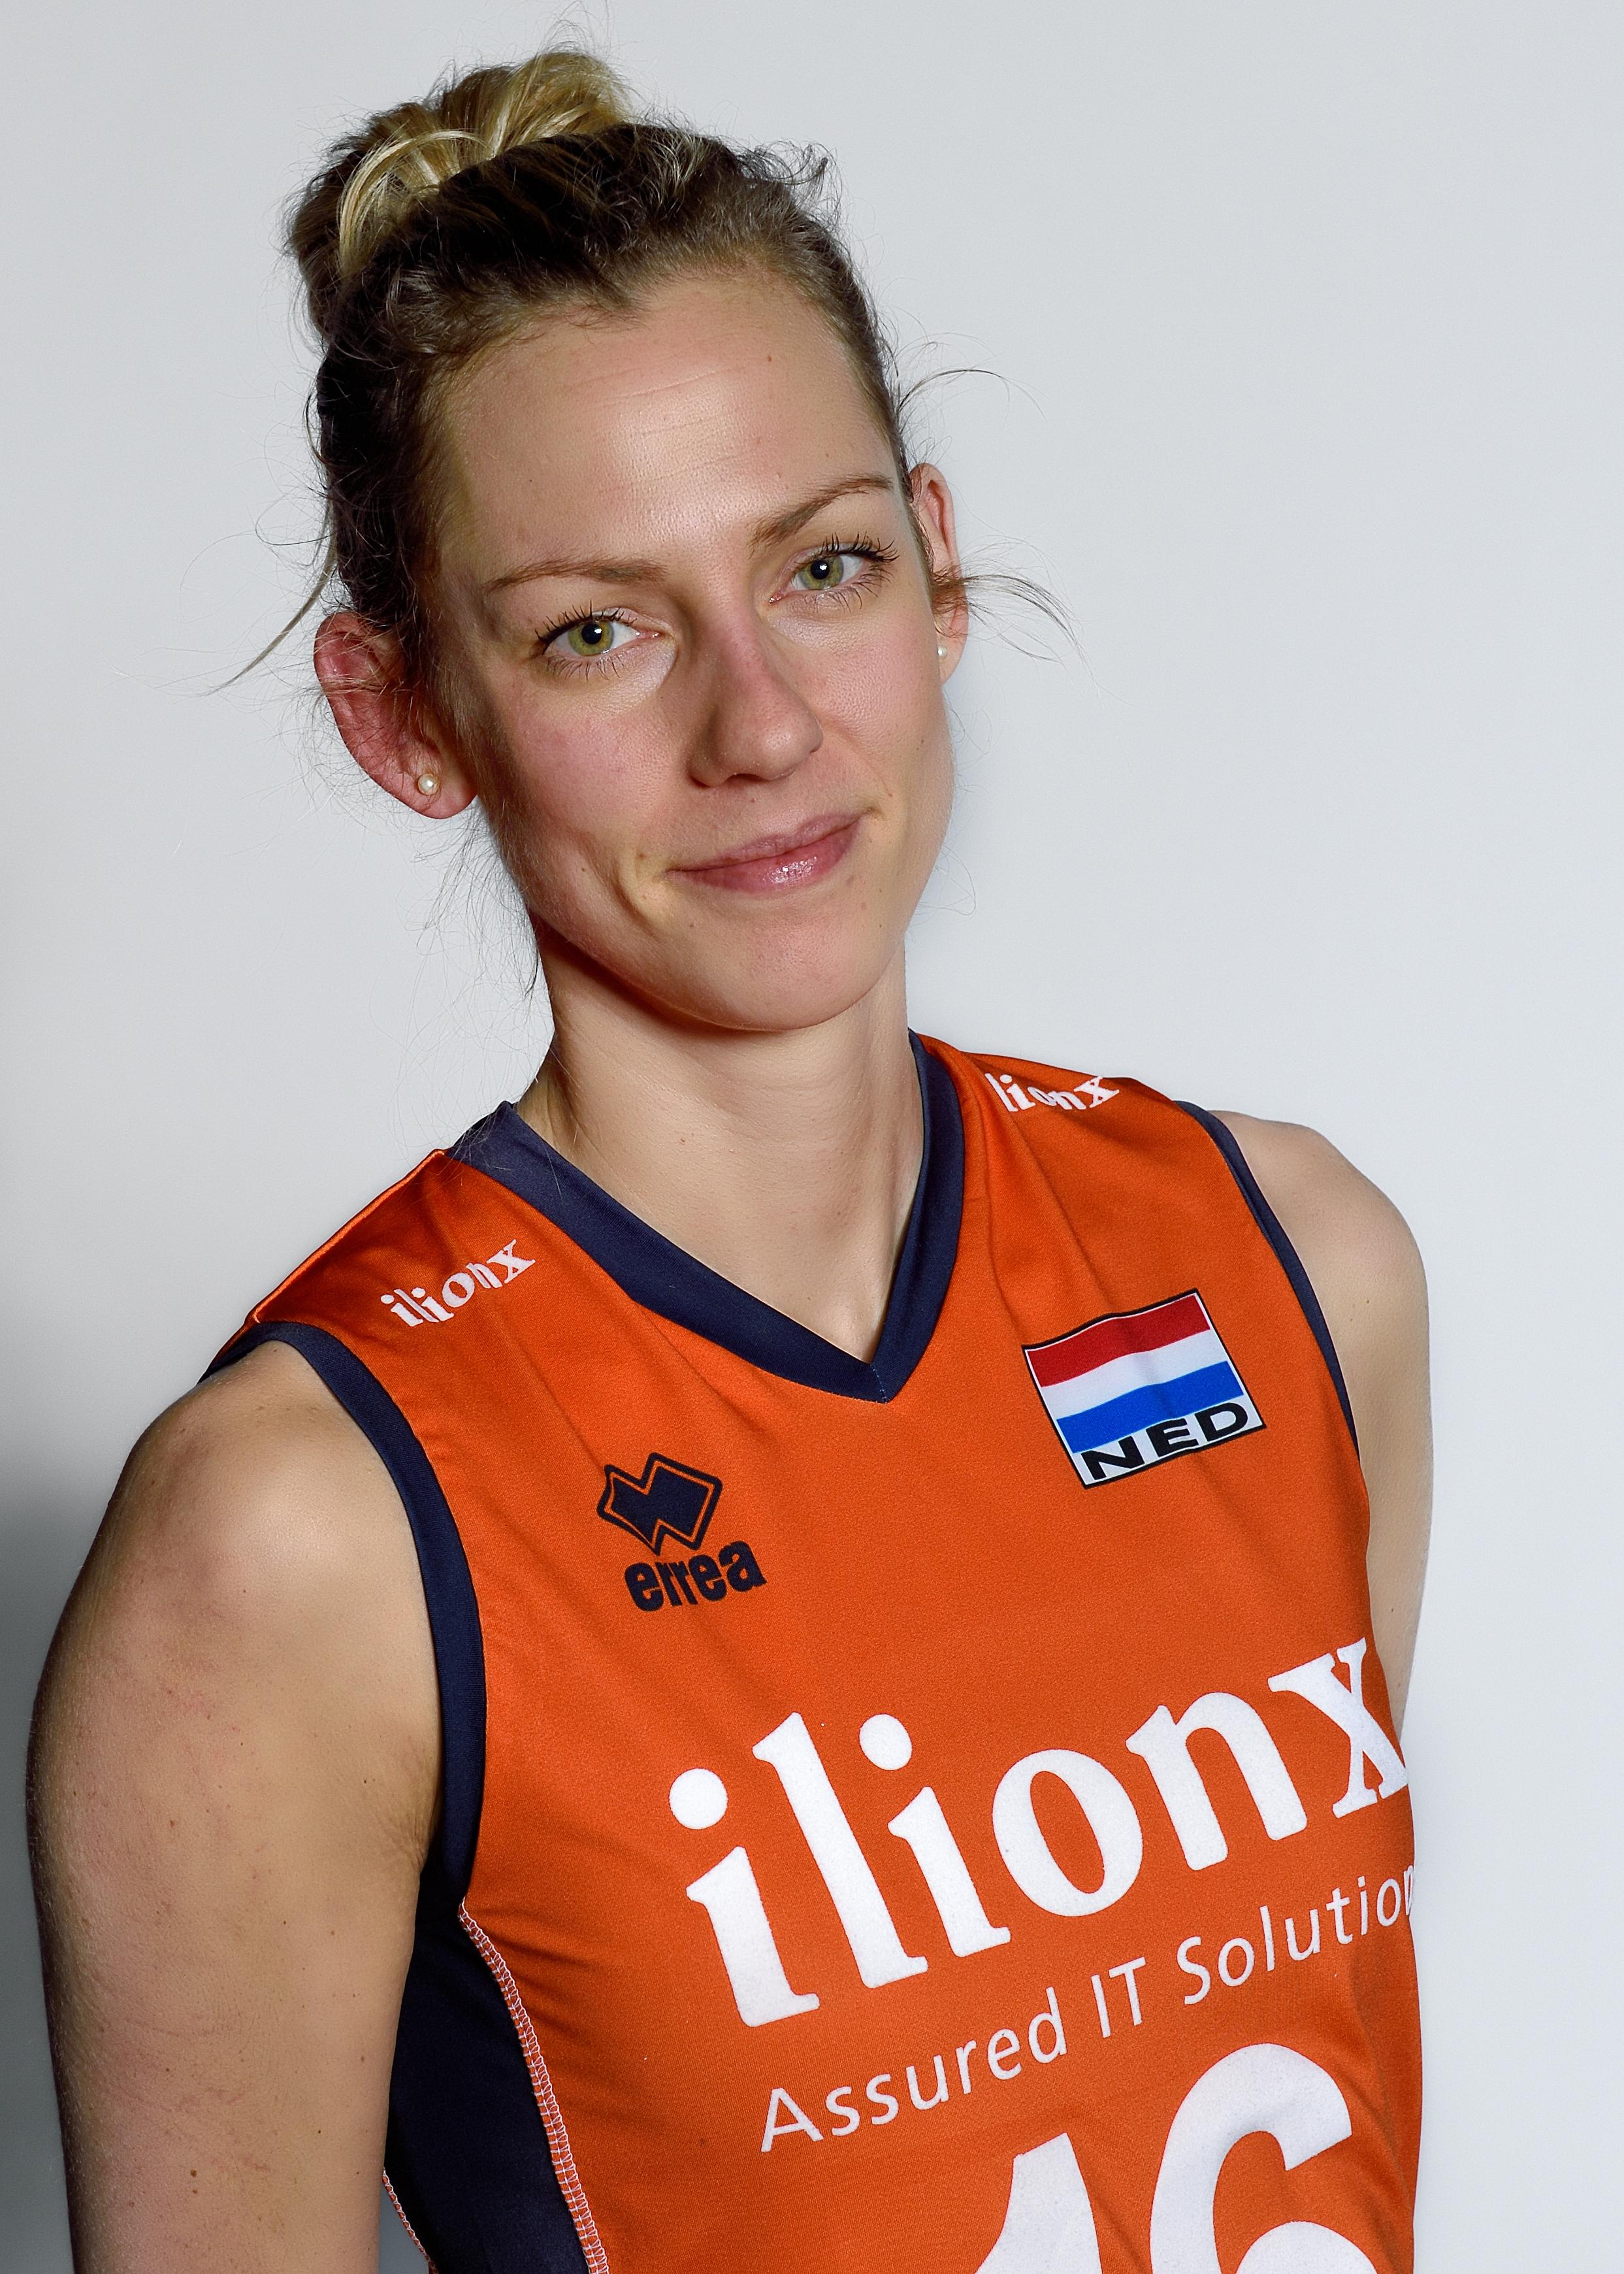 Debby Stam-Pilon